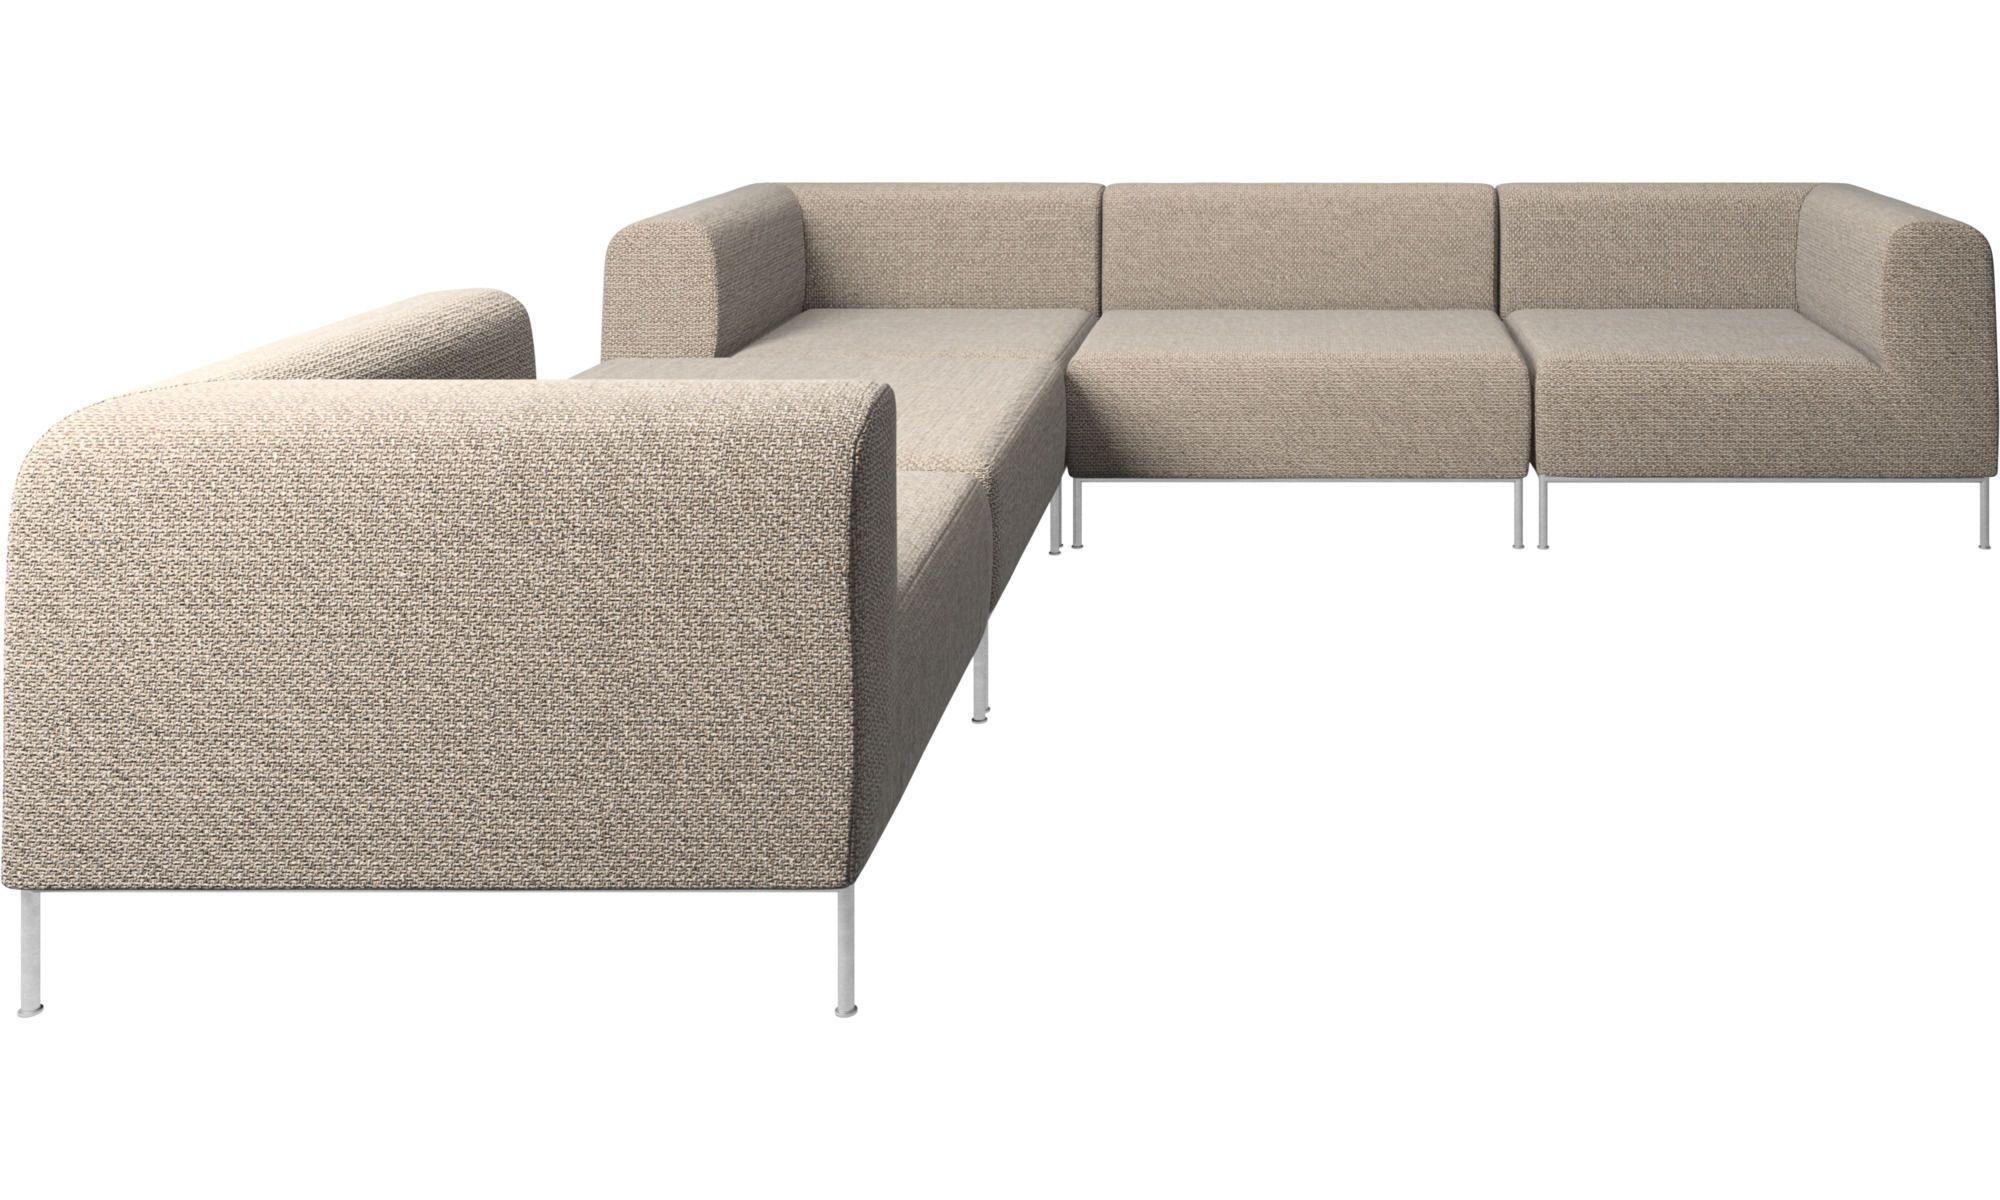 Modular sofas Miami corner sofa with footstool on left